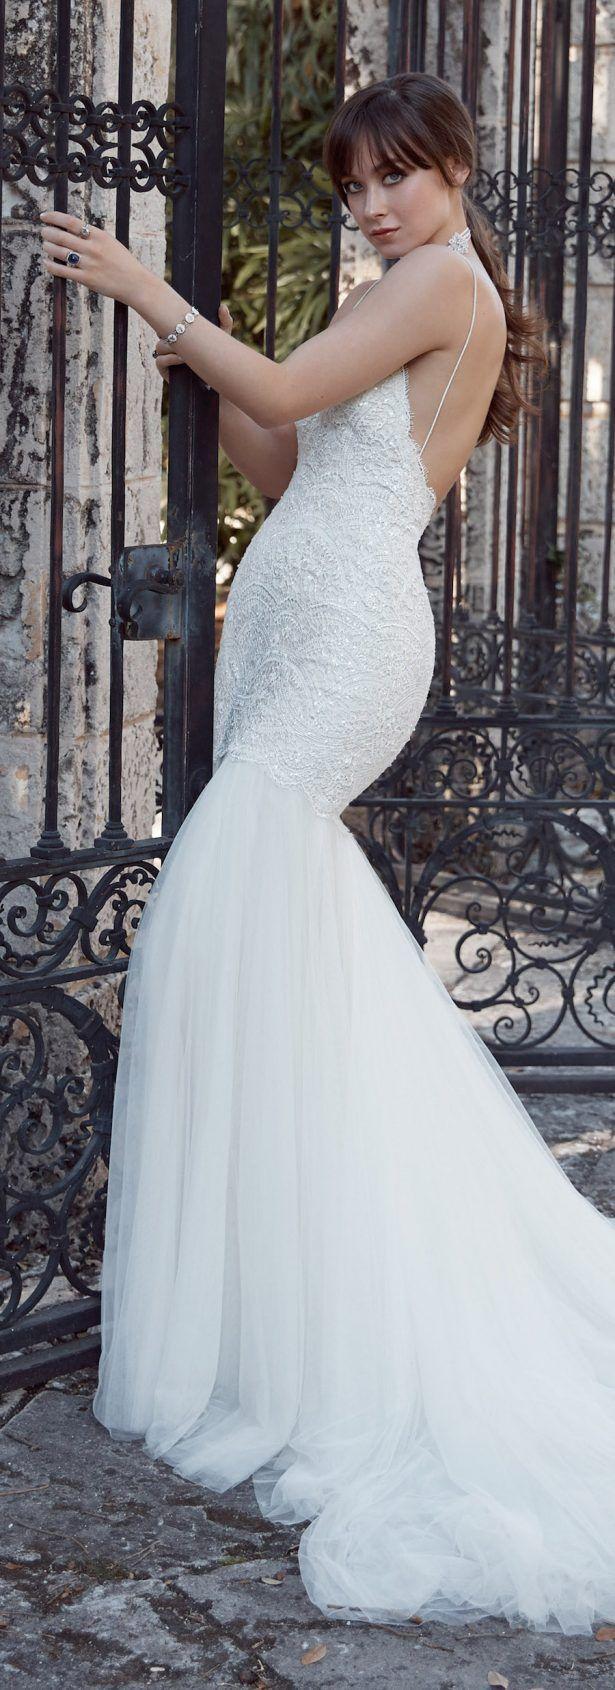 Unique Wedding Dress Shops In Baton Rouge Mold - All Wedding Dresses ...